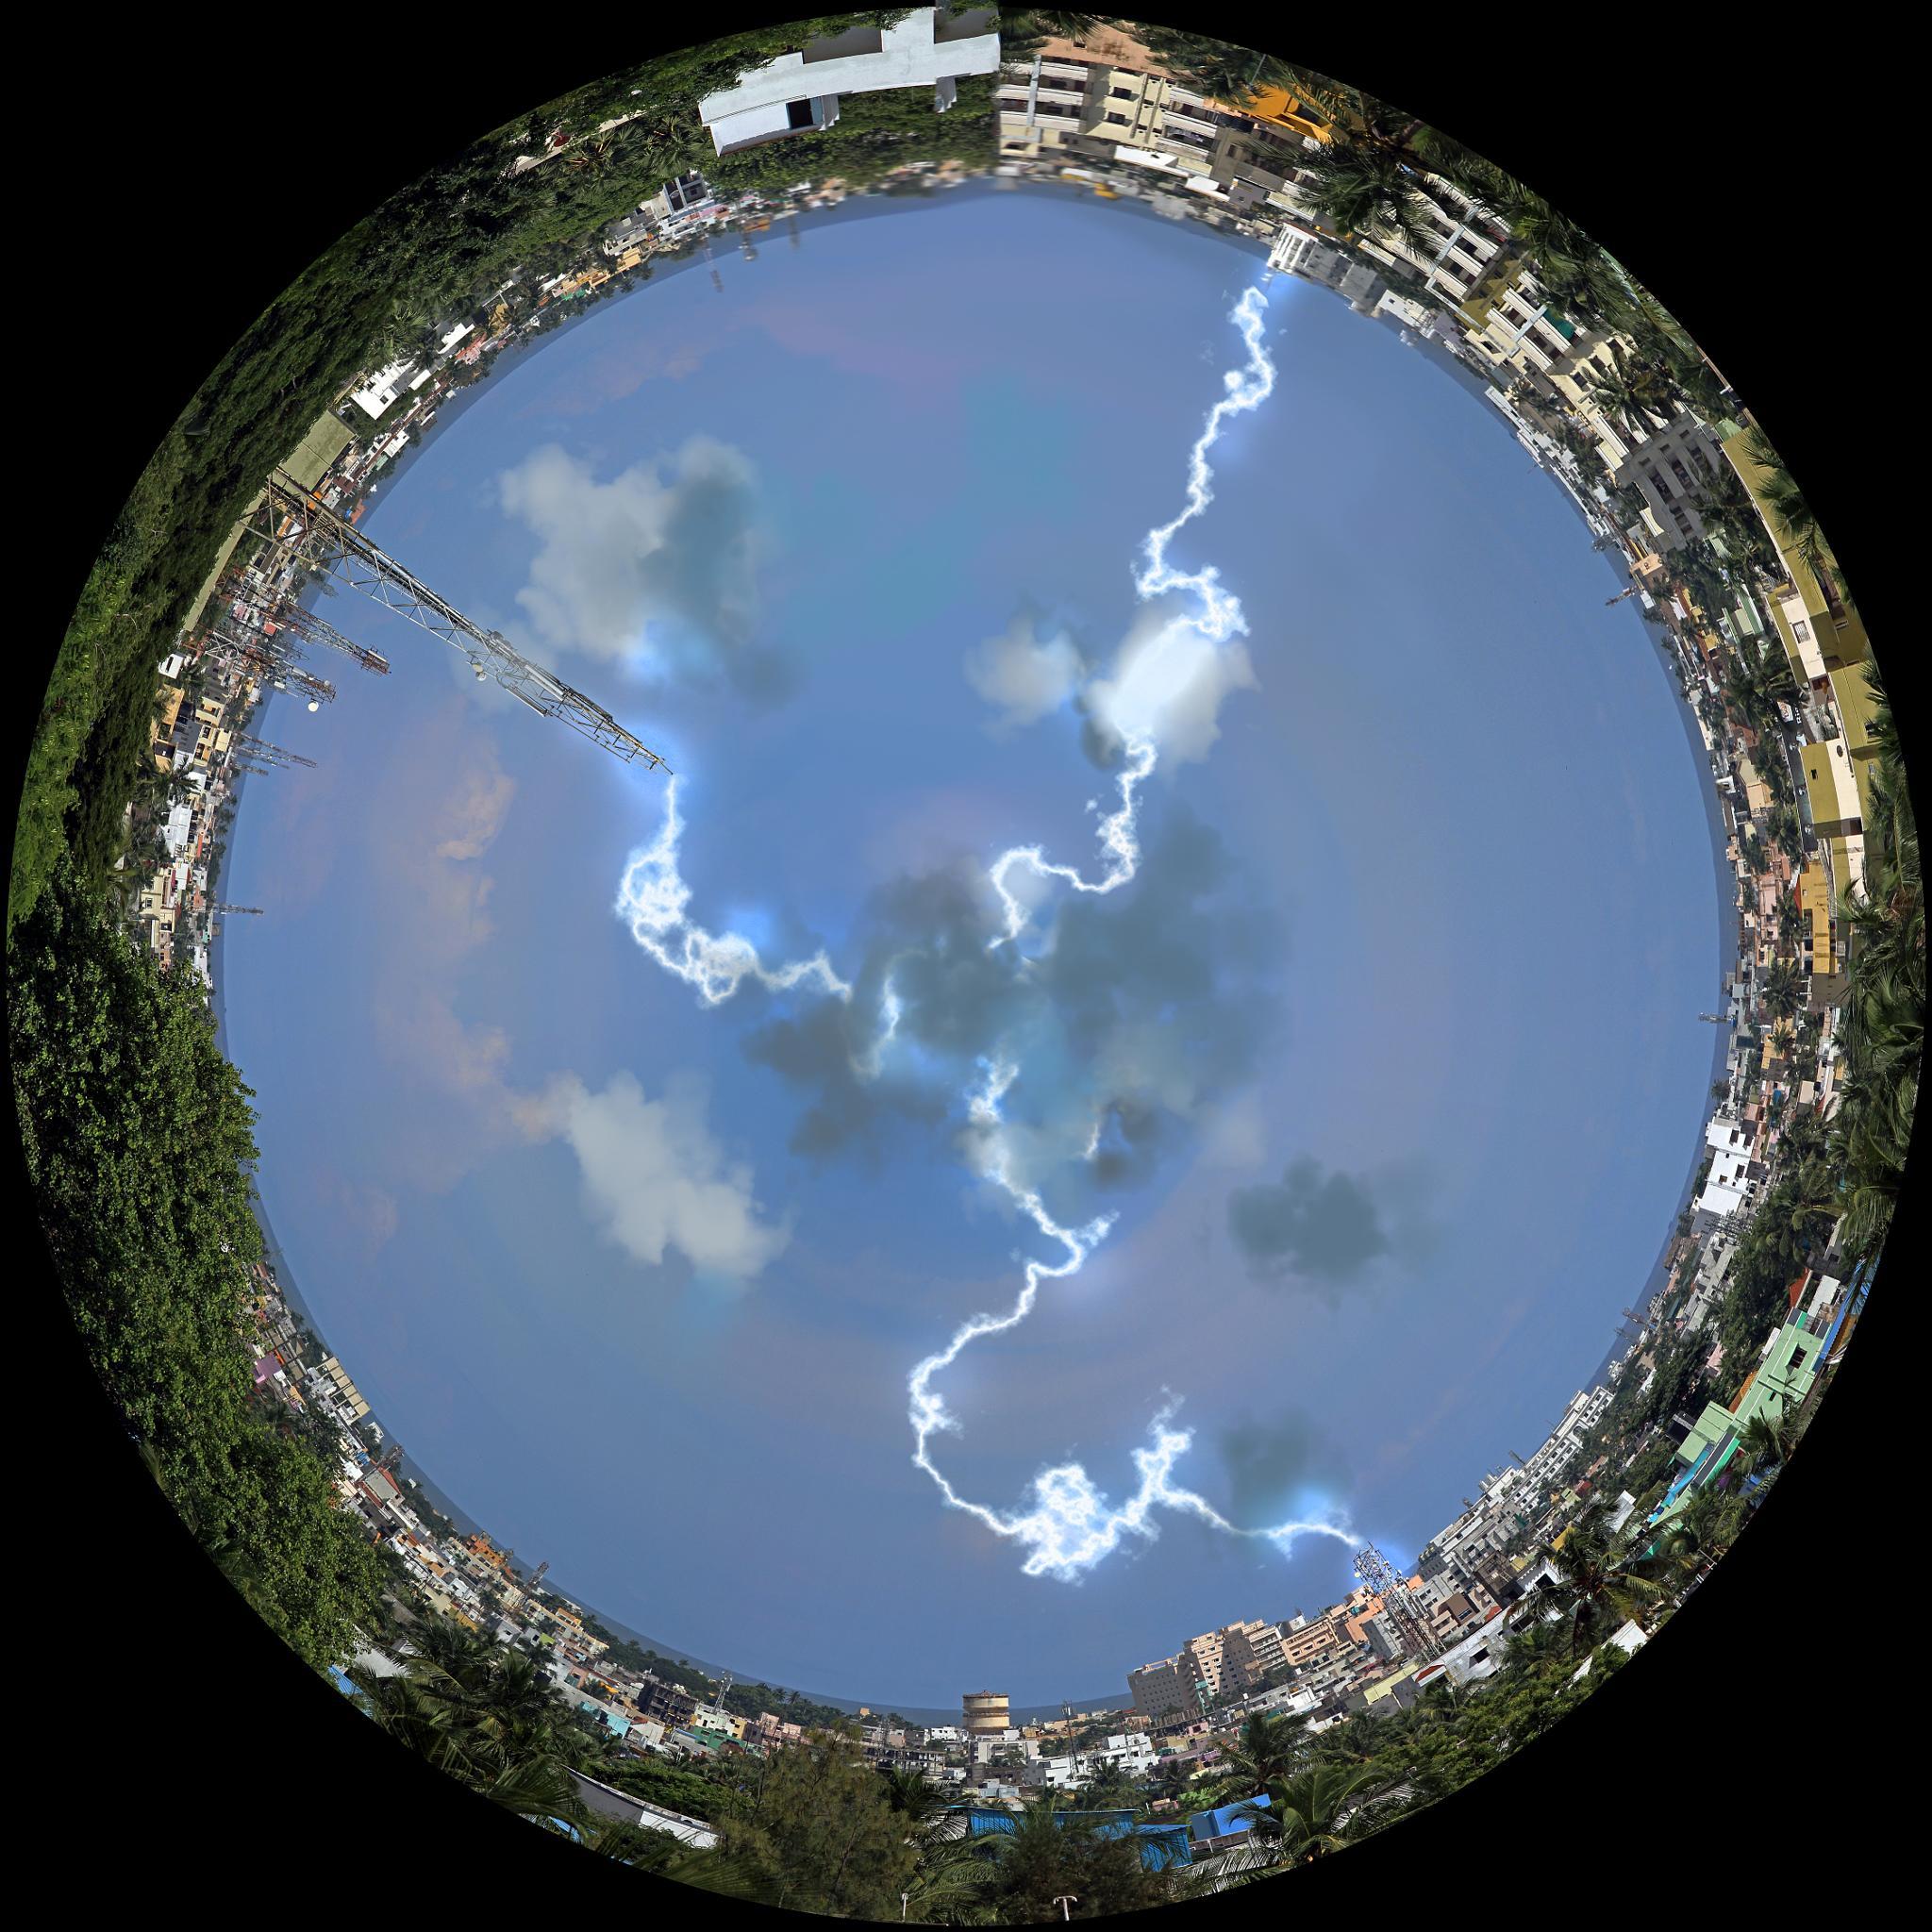 Lightning in the tunnel town by Karthik Easvur